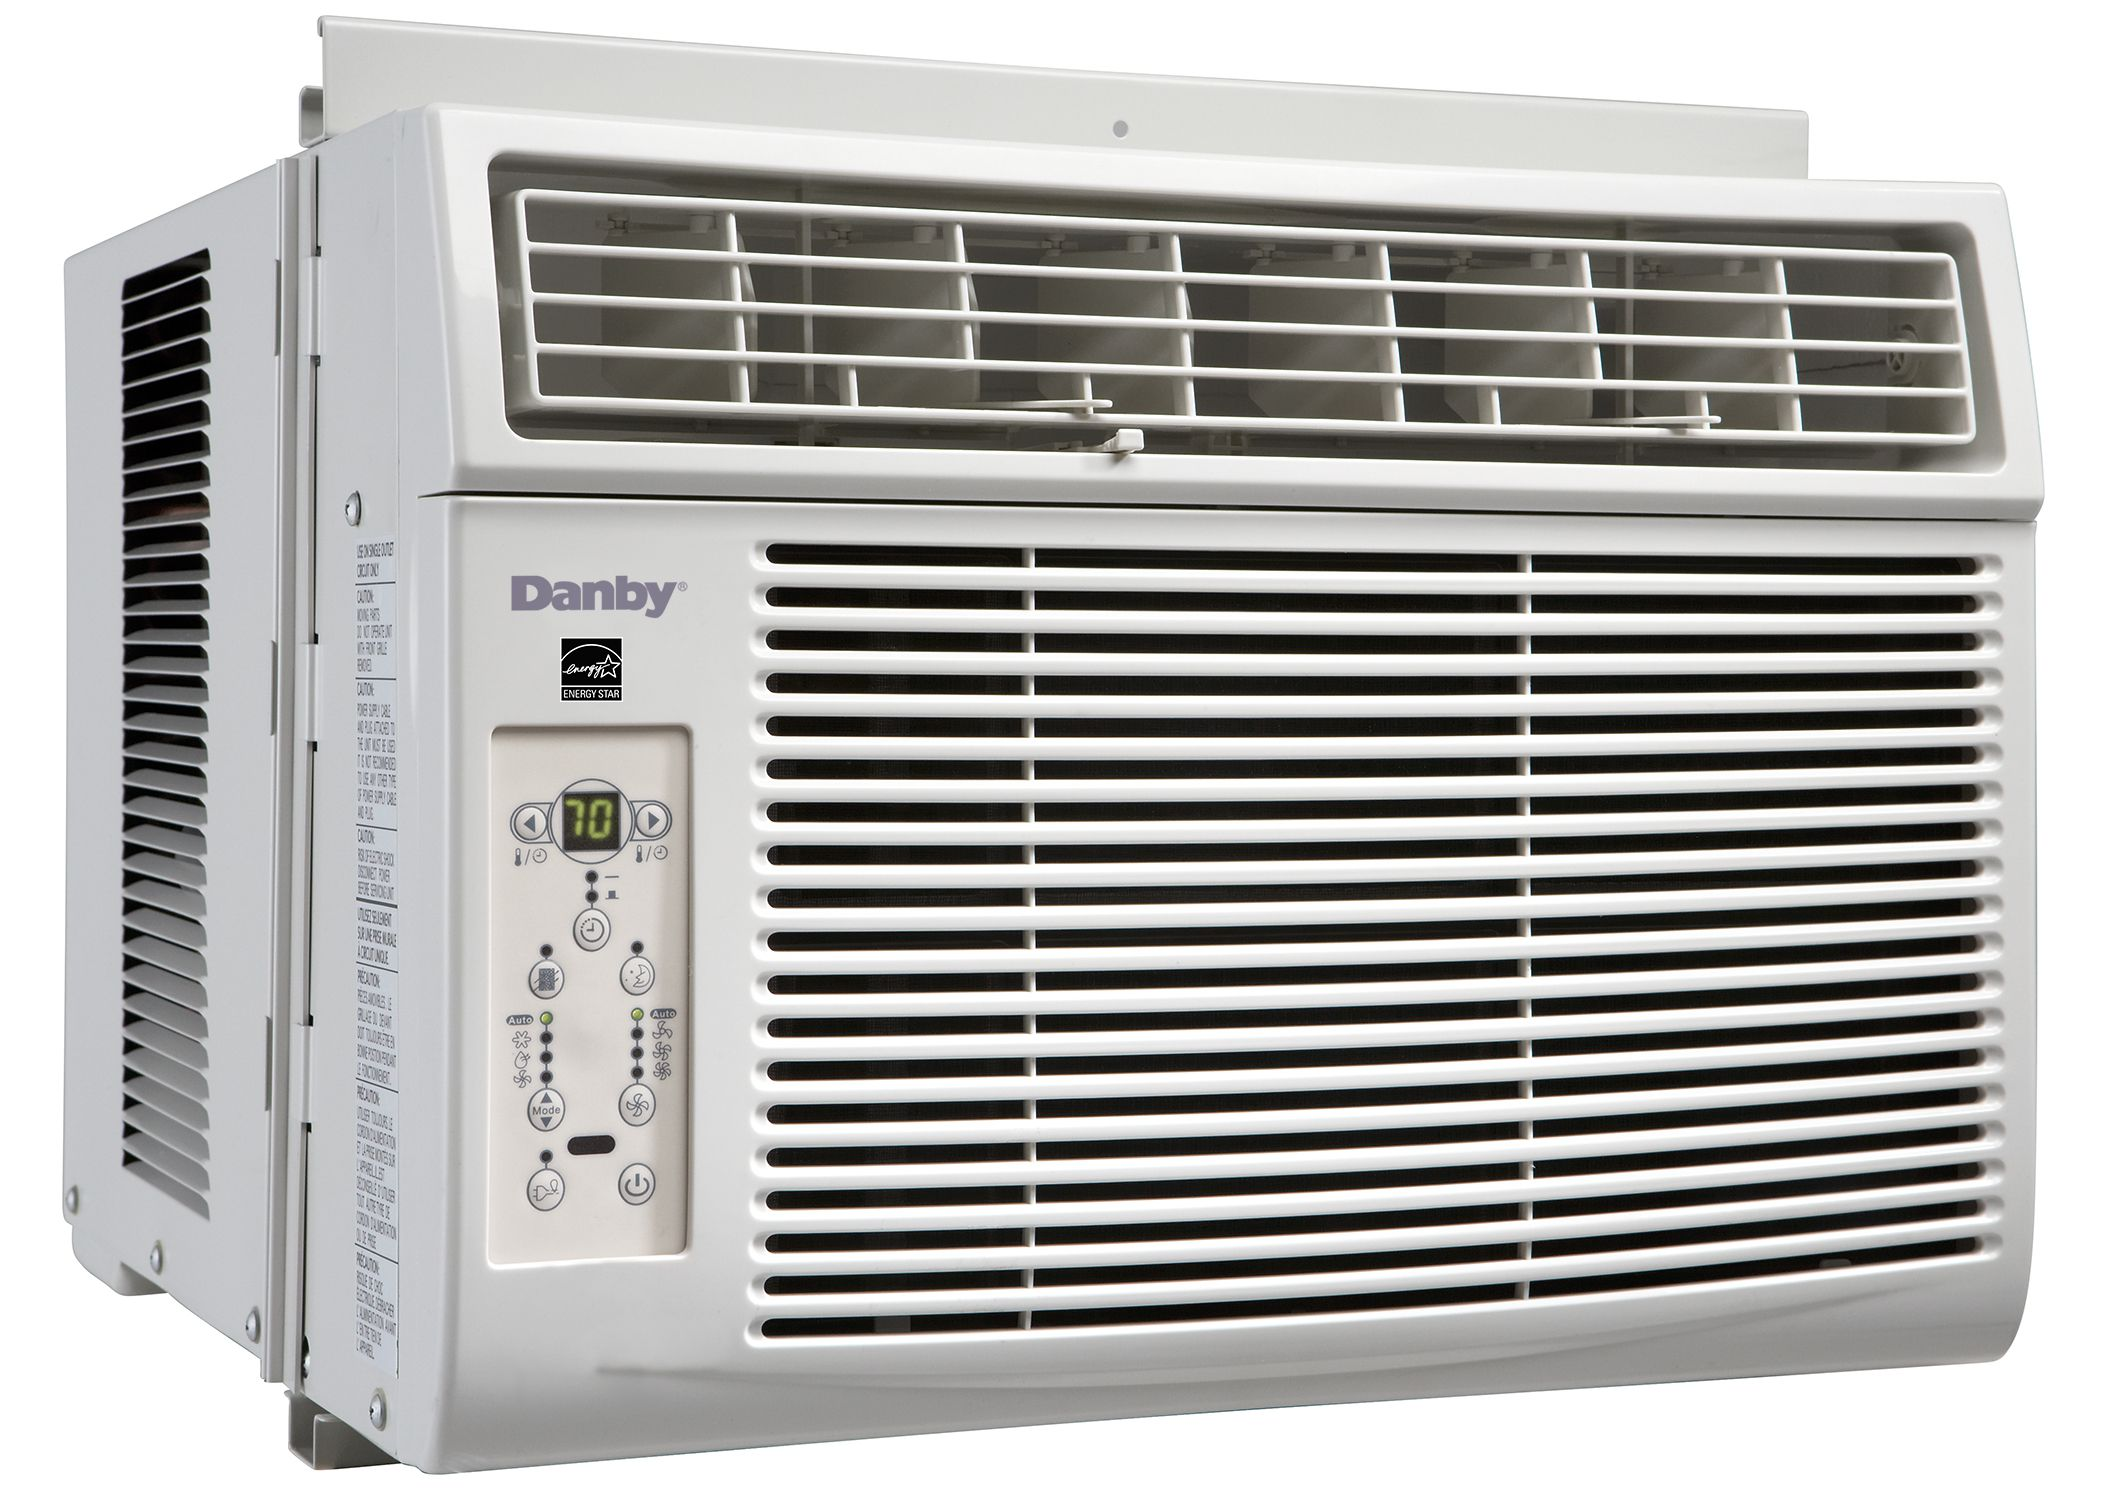 window air conditioners danby appliance parts rh danbyapplianceparts com Danby DPAC120068 Instruction Manual Danby Air Conditioner Manual Online